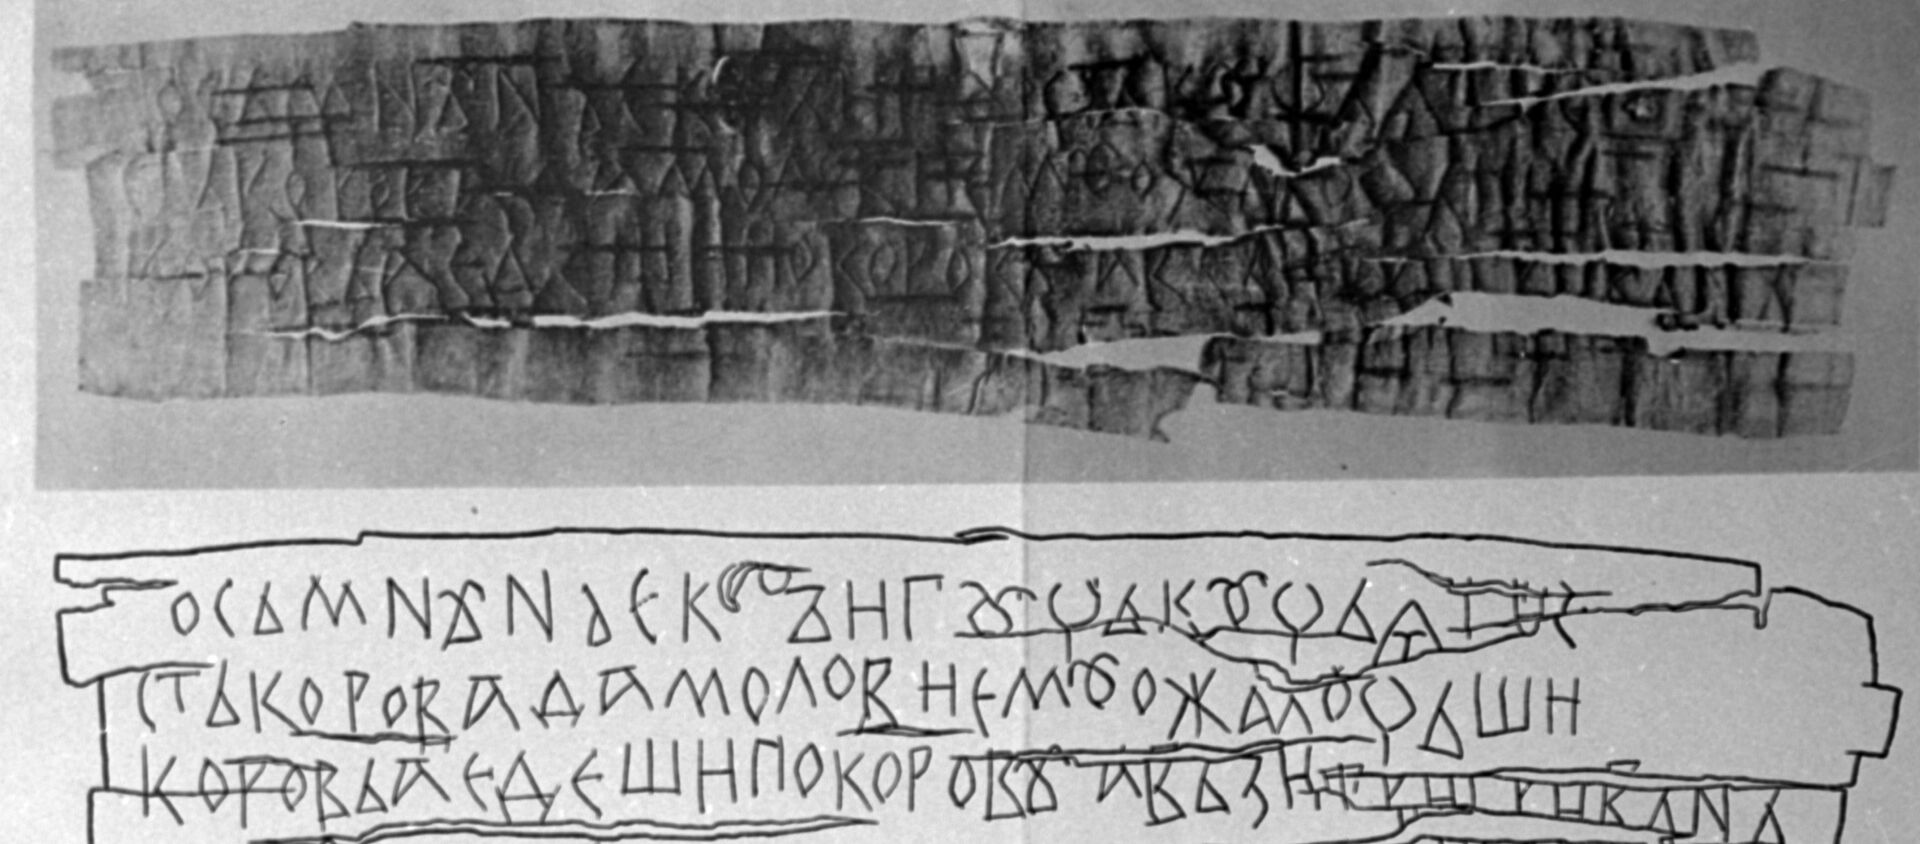 Carta de corteza de abedul sobre una vaca - Sputnik Mundo, 1920, 03.02.2020